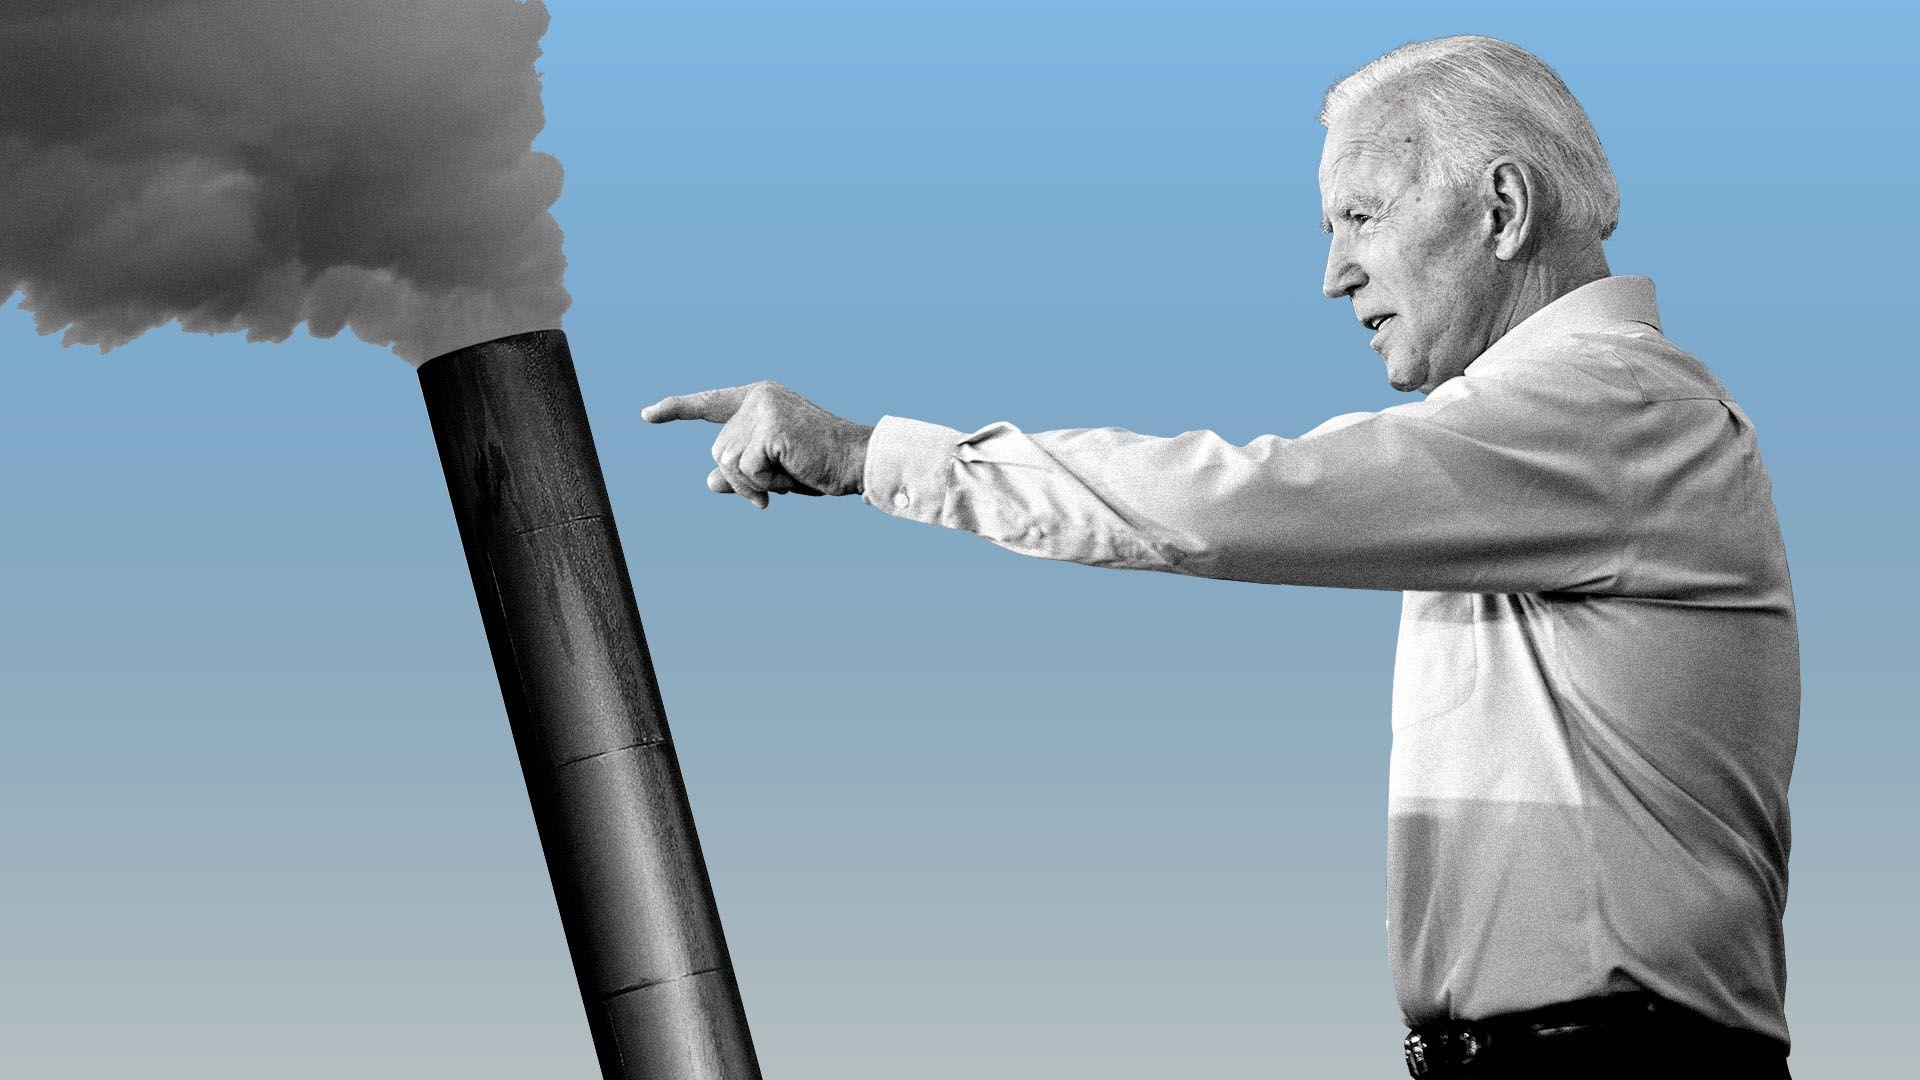 Illustration of Joe Biden pushing over a smokestack